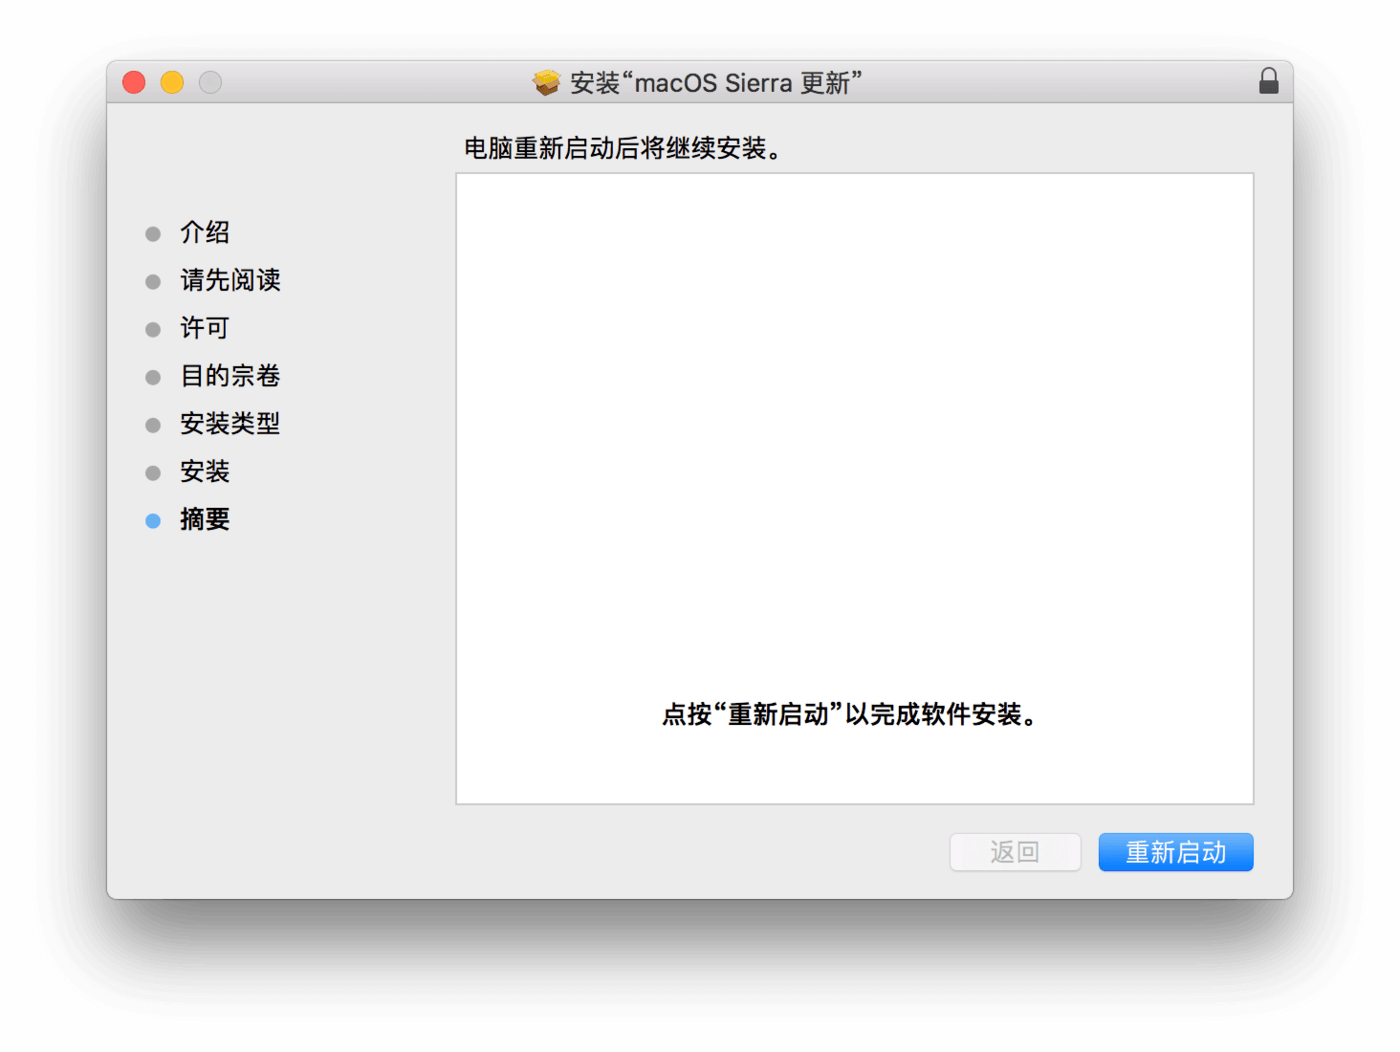 安装完成 macOS 更新提示重启电脑